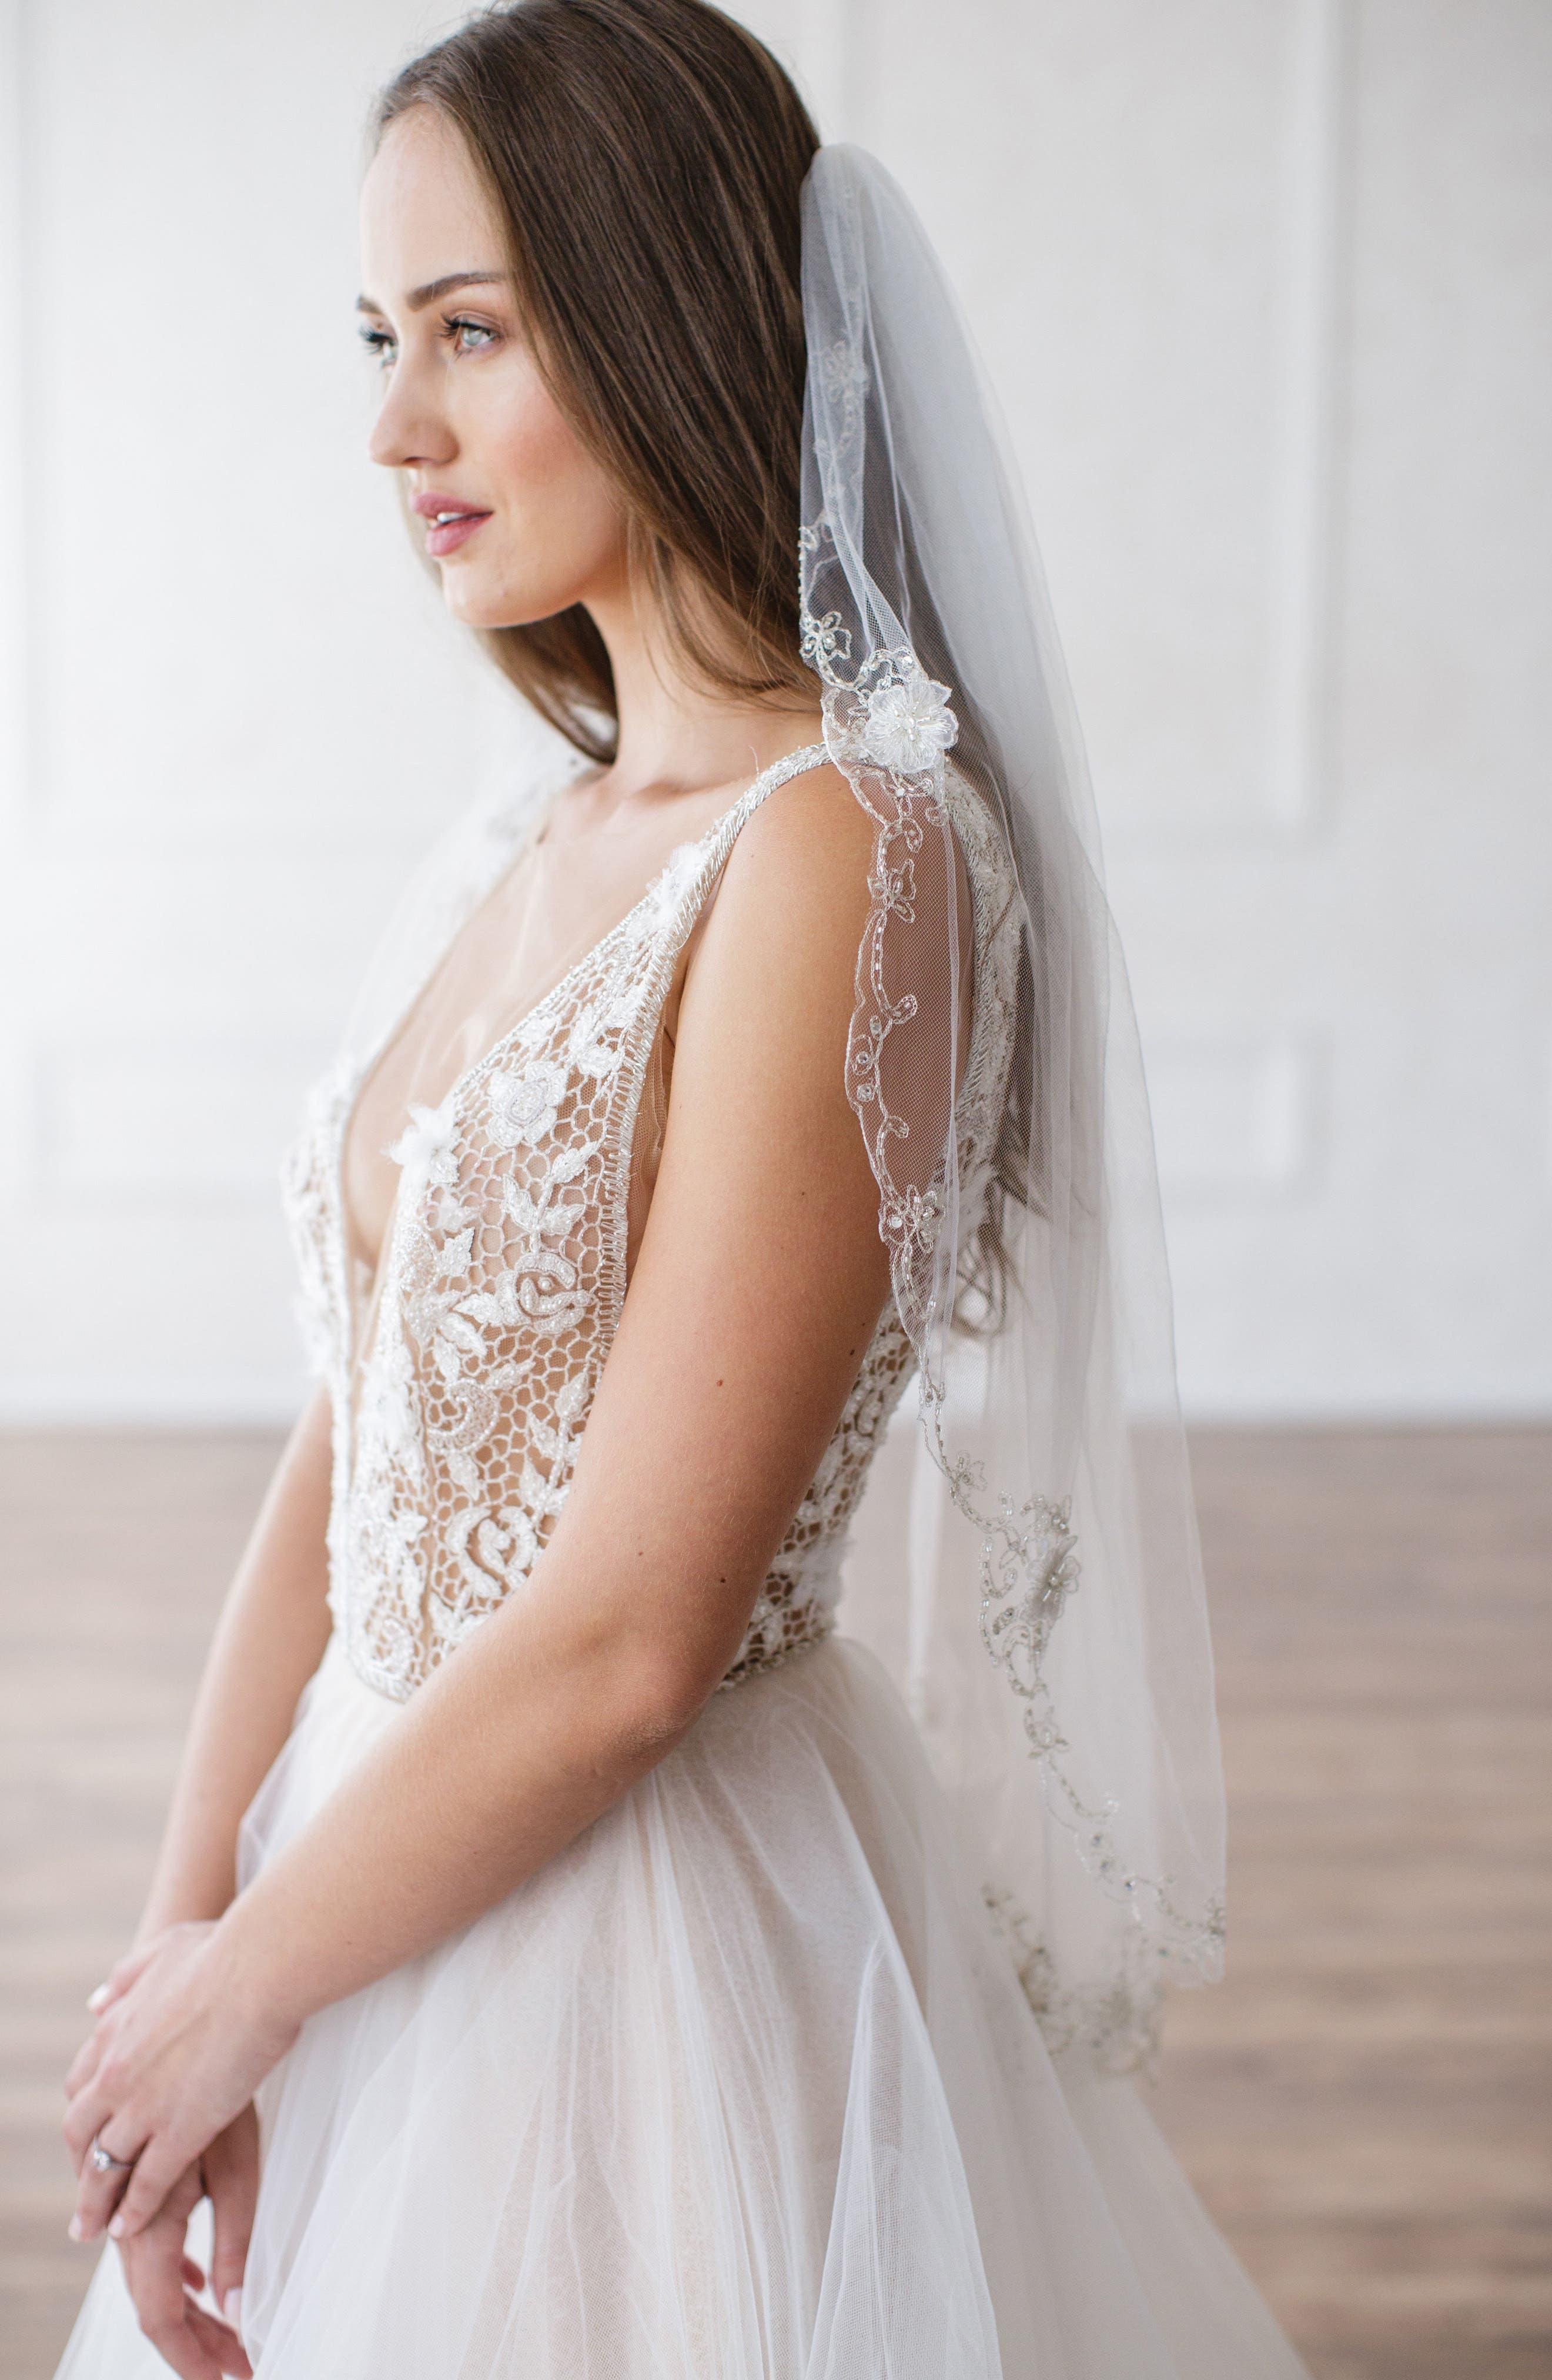 Brides & Hairpins Marina Embellished Veil